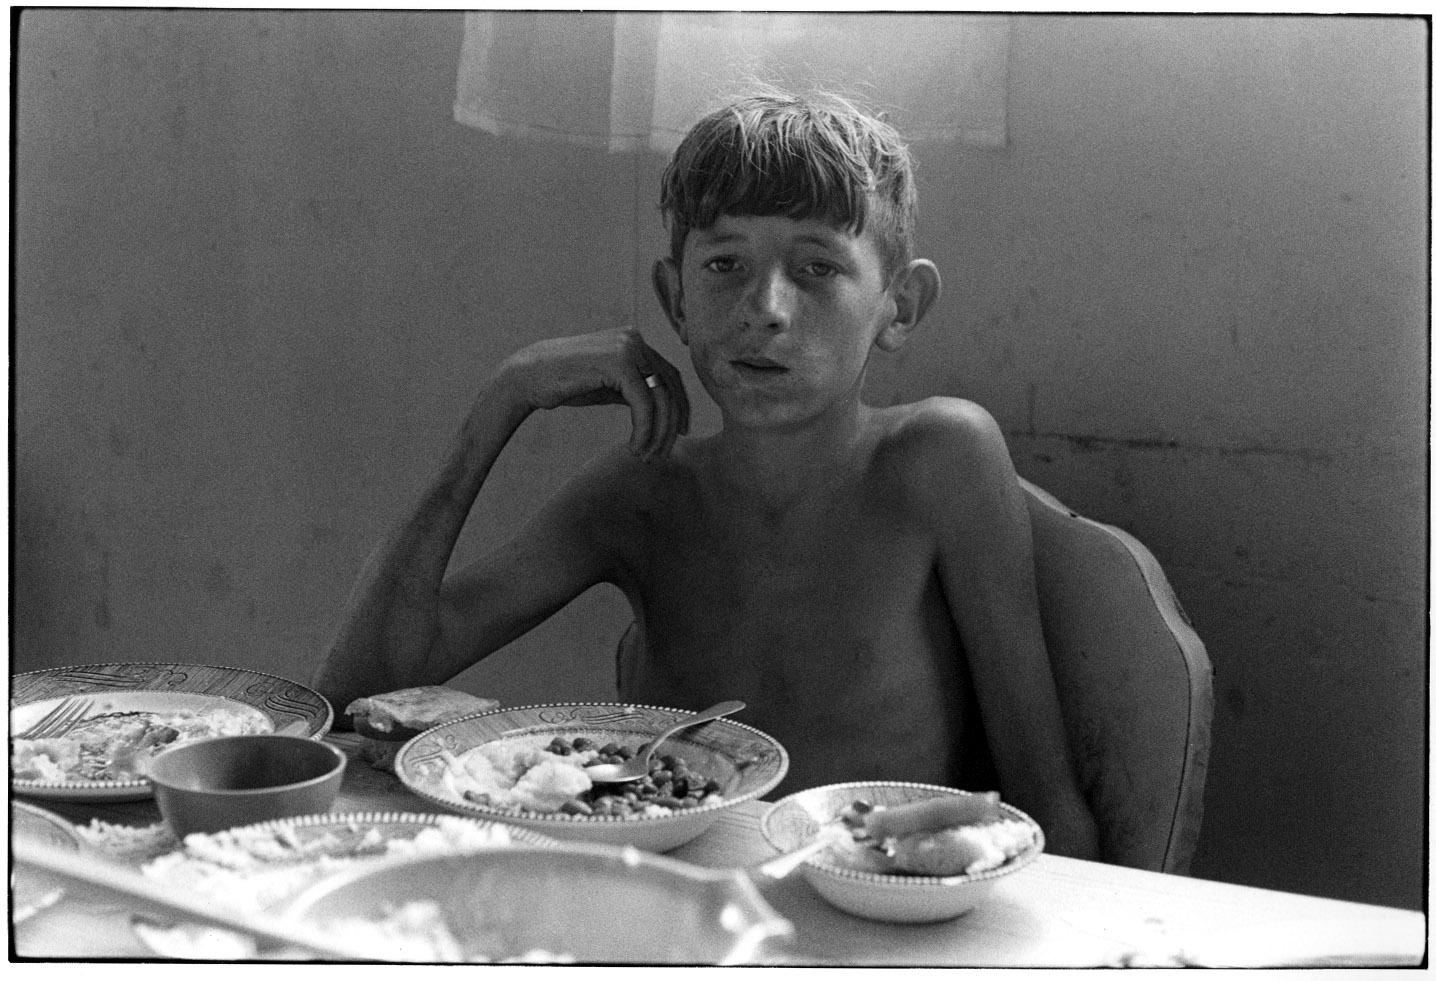 """Boy at dinner table"" - William Gedney, 1972"